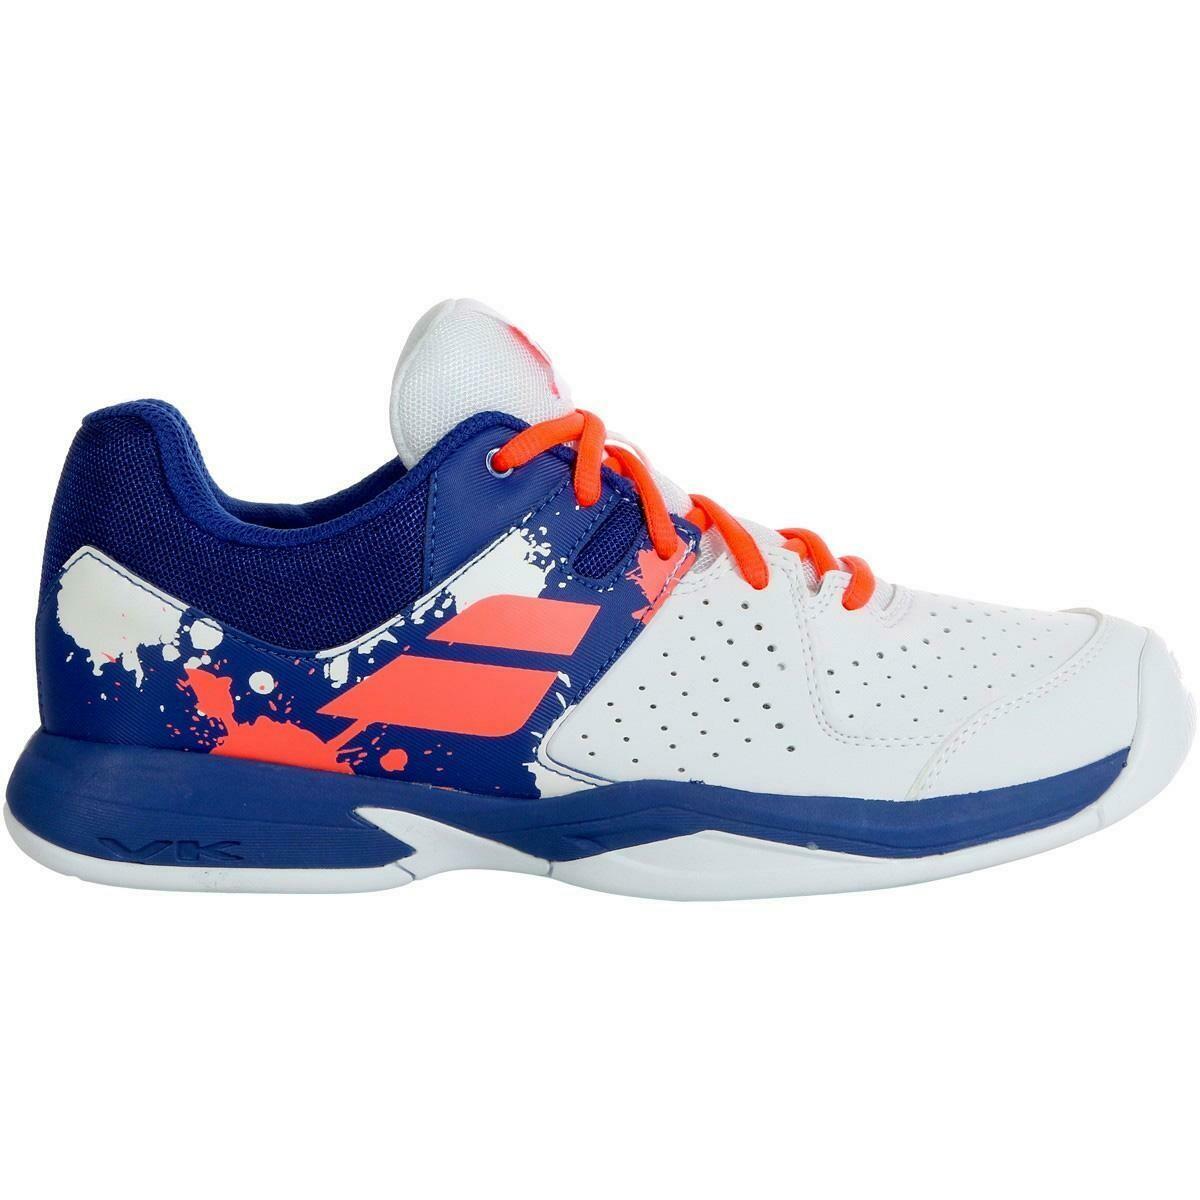 Babolat Pulsion Junior Tennis Shoes - White